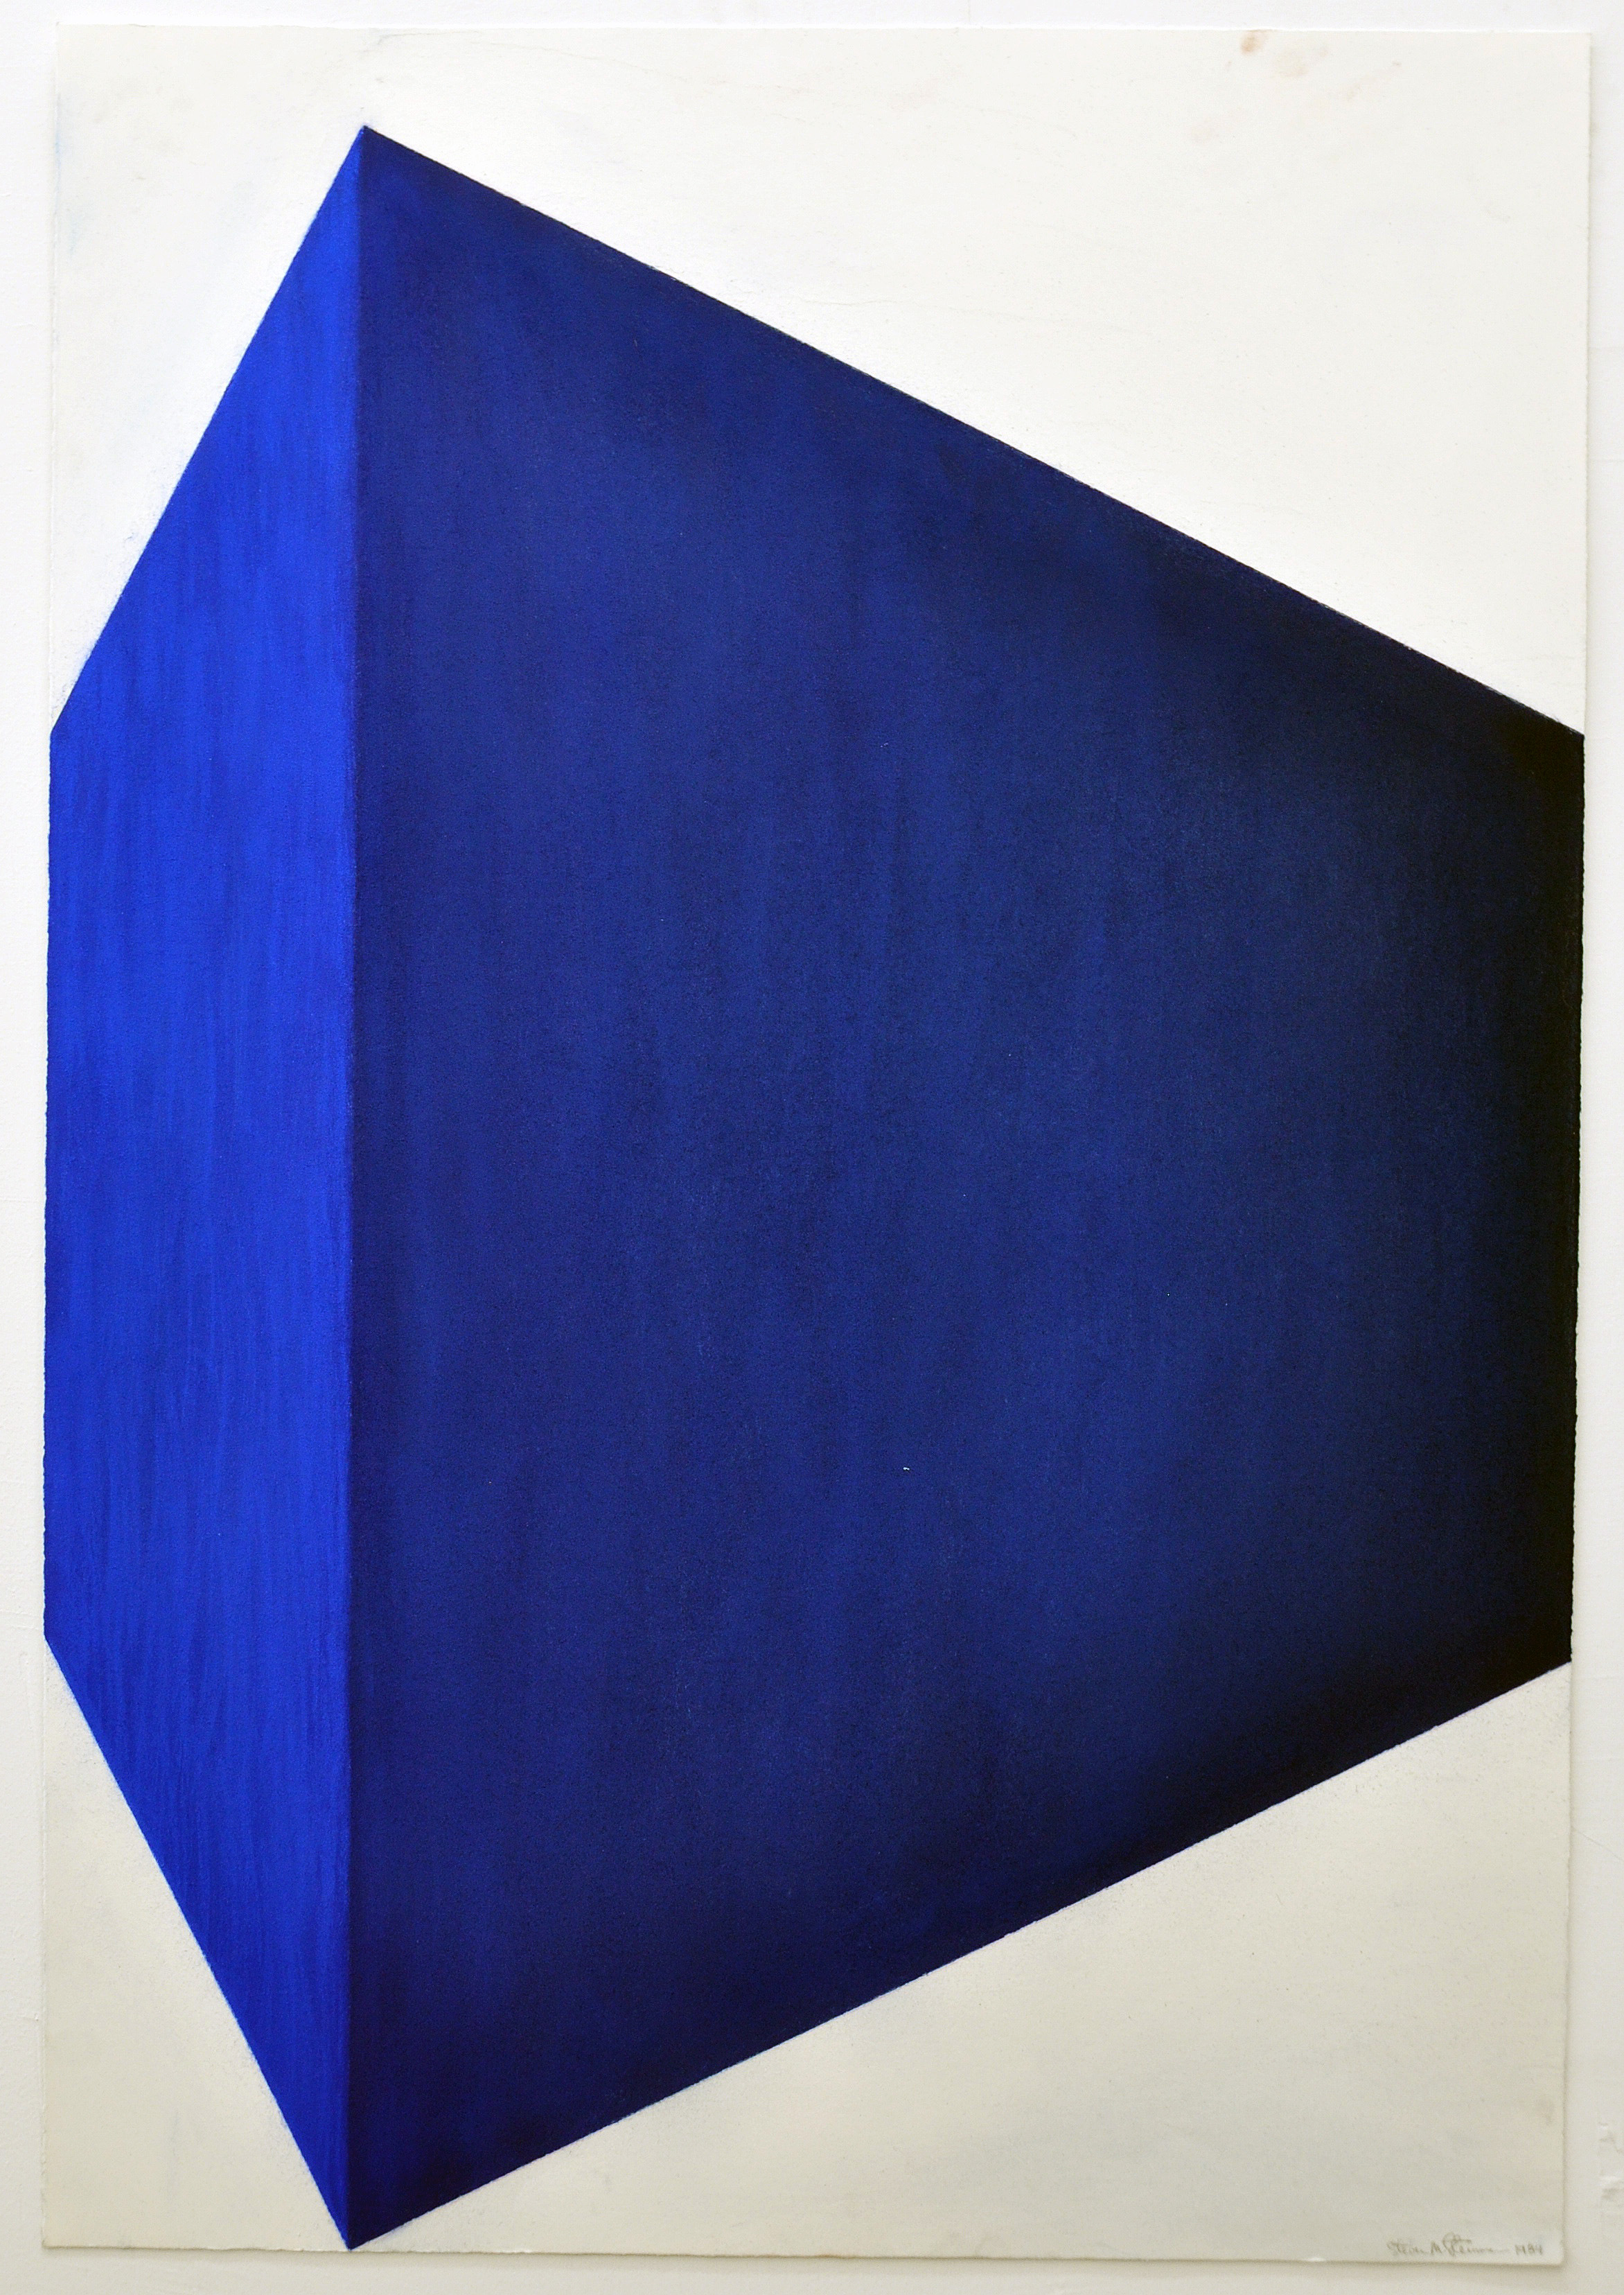 Blue Shadows 1989